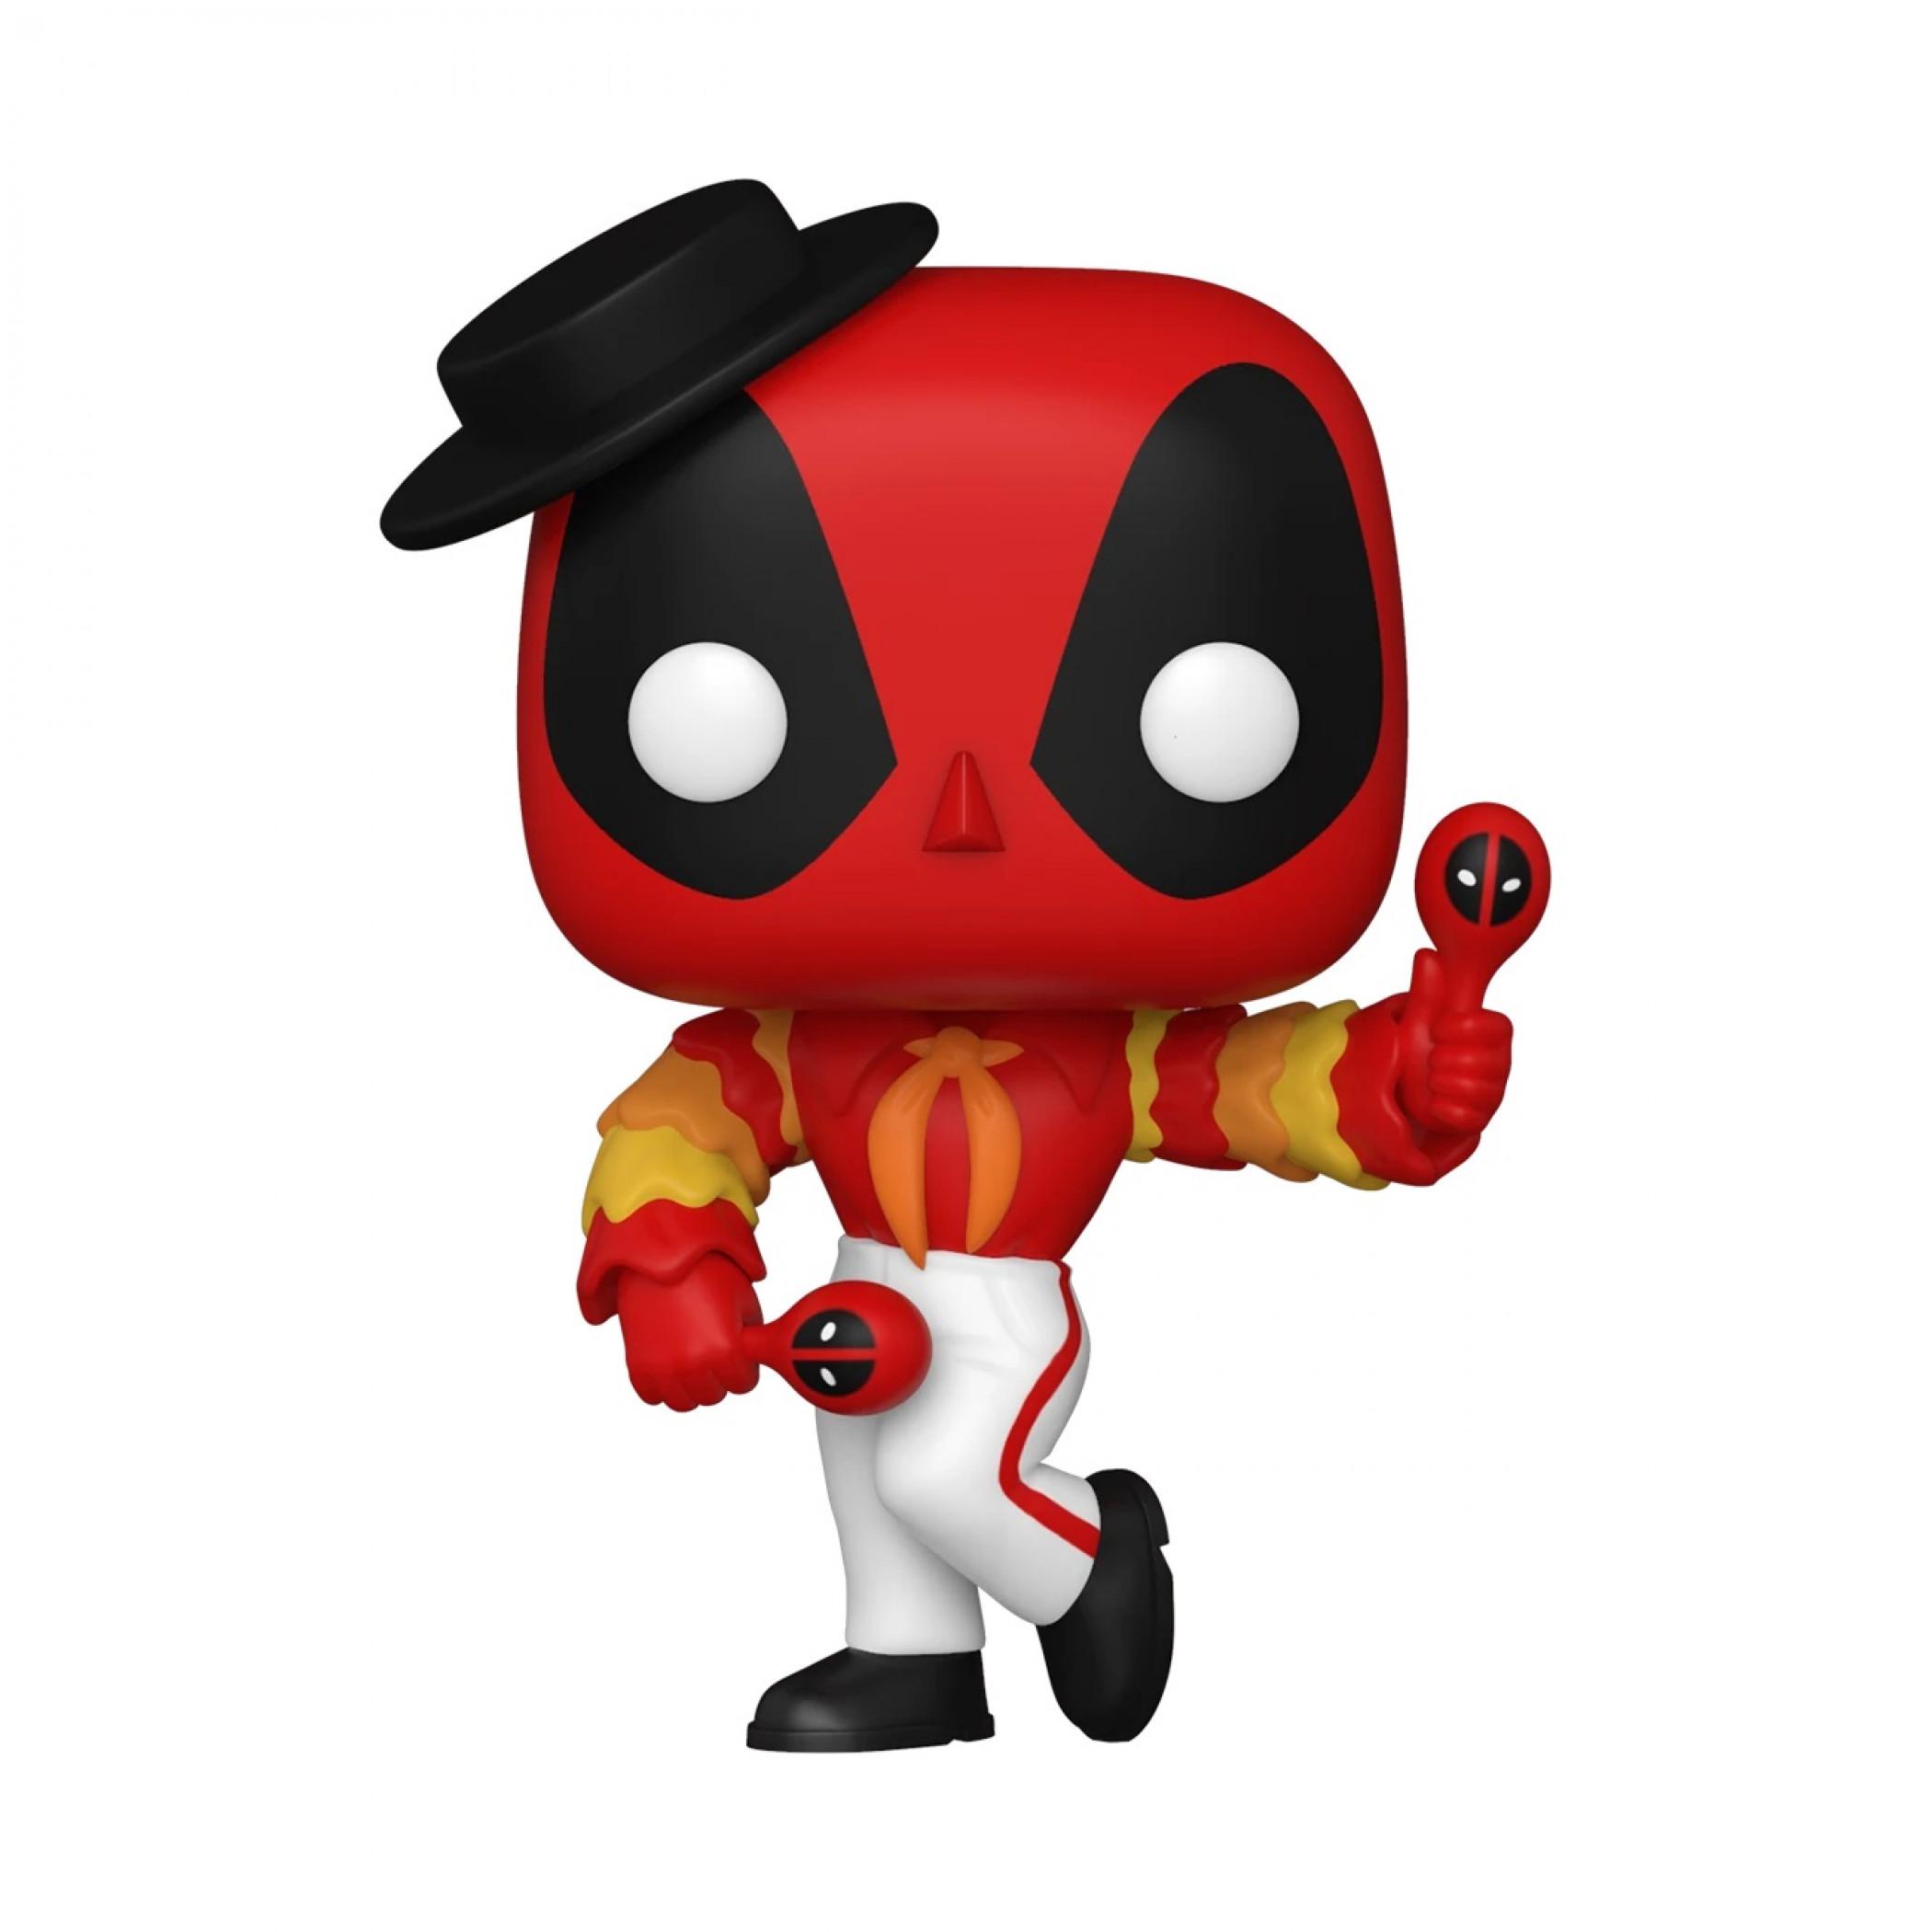 Deadpool 30th Anniversary Flamenco Deadpool Funko Pop! Vinyl Figure